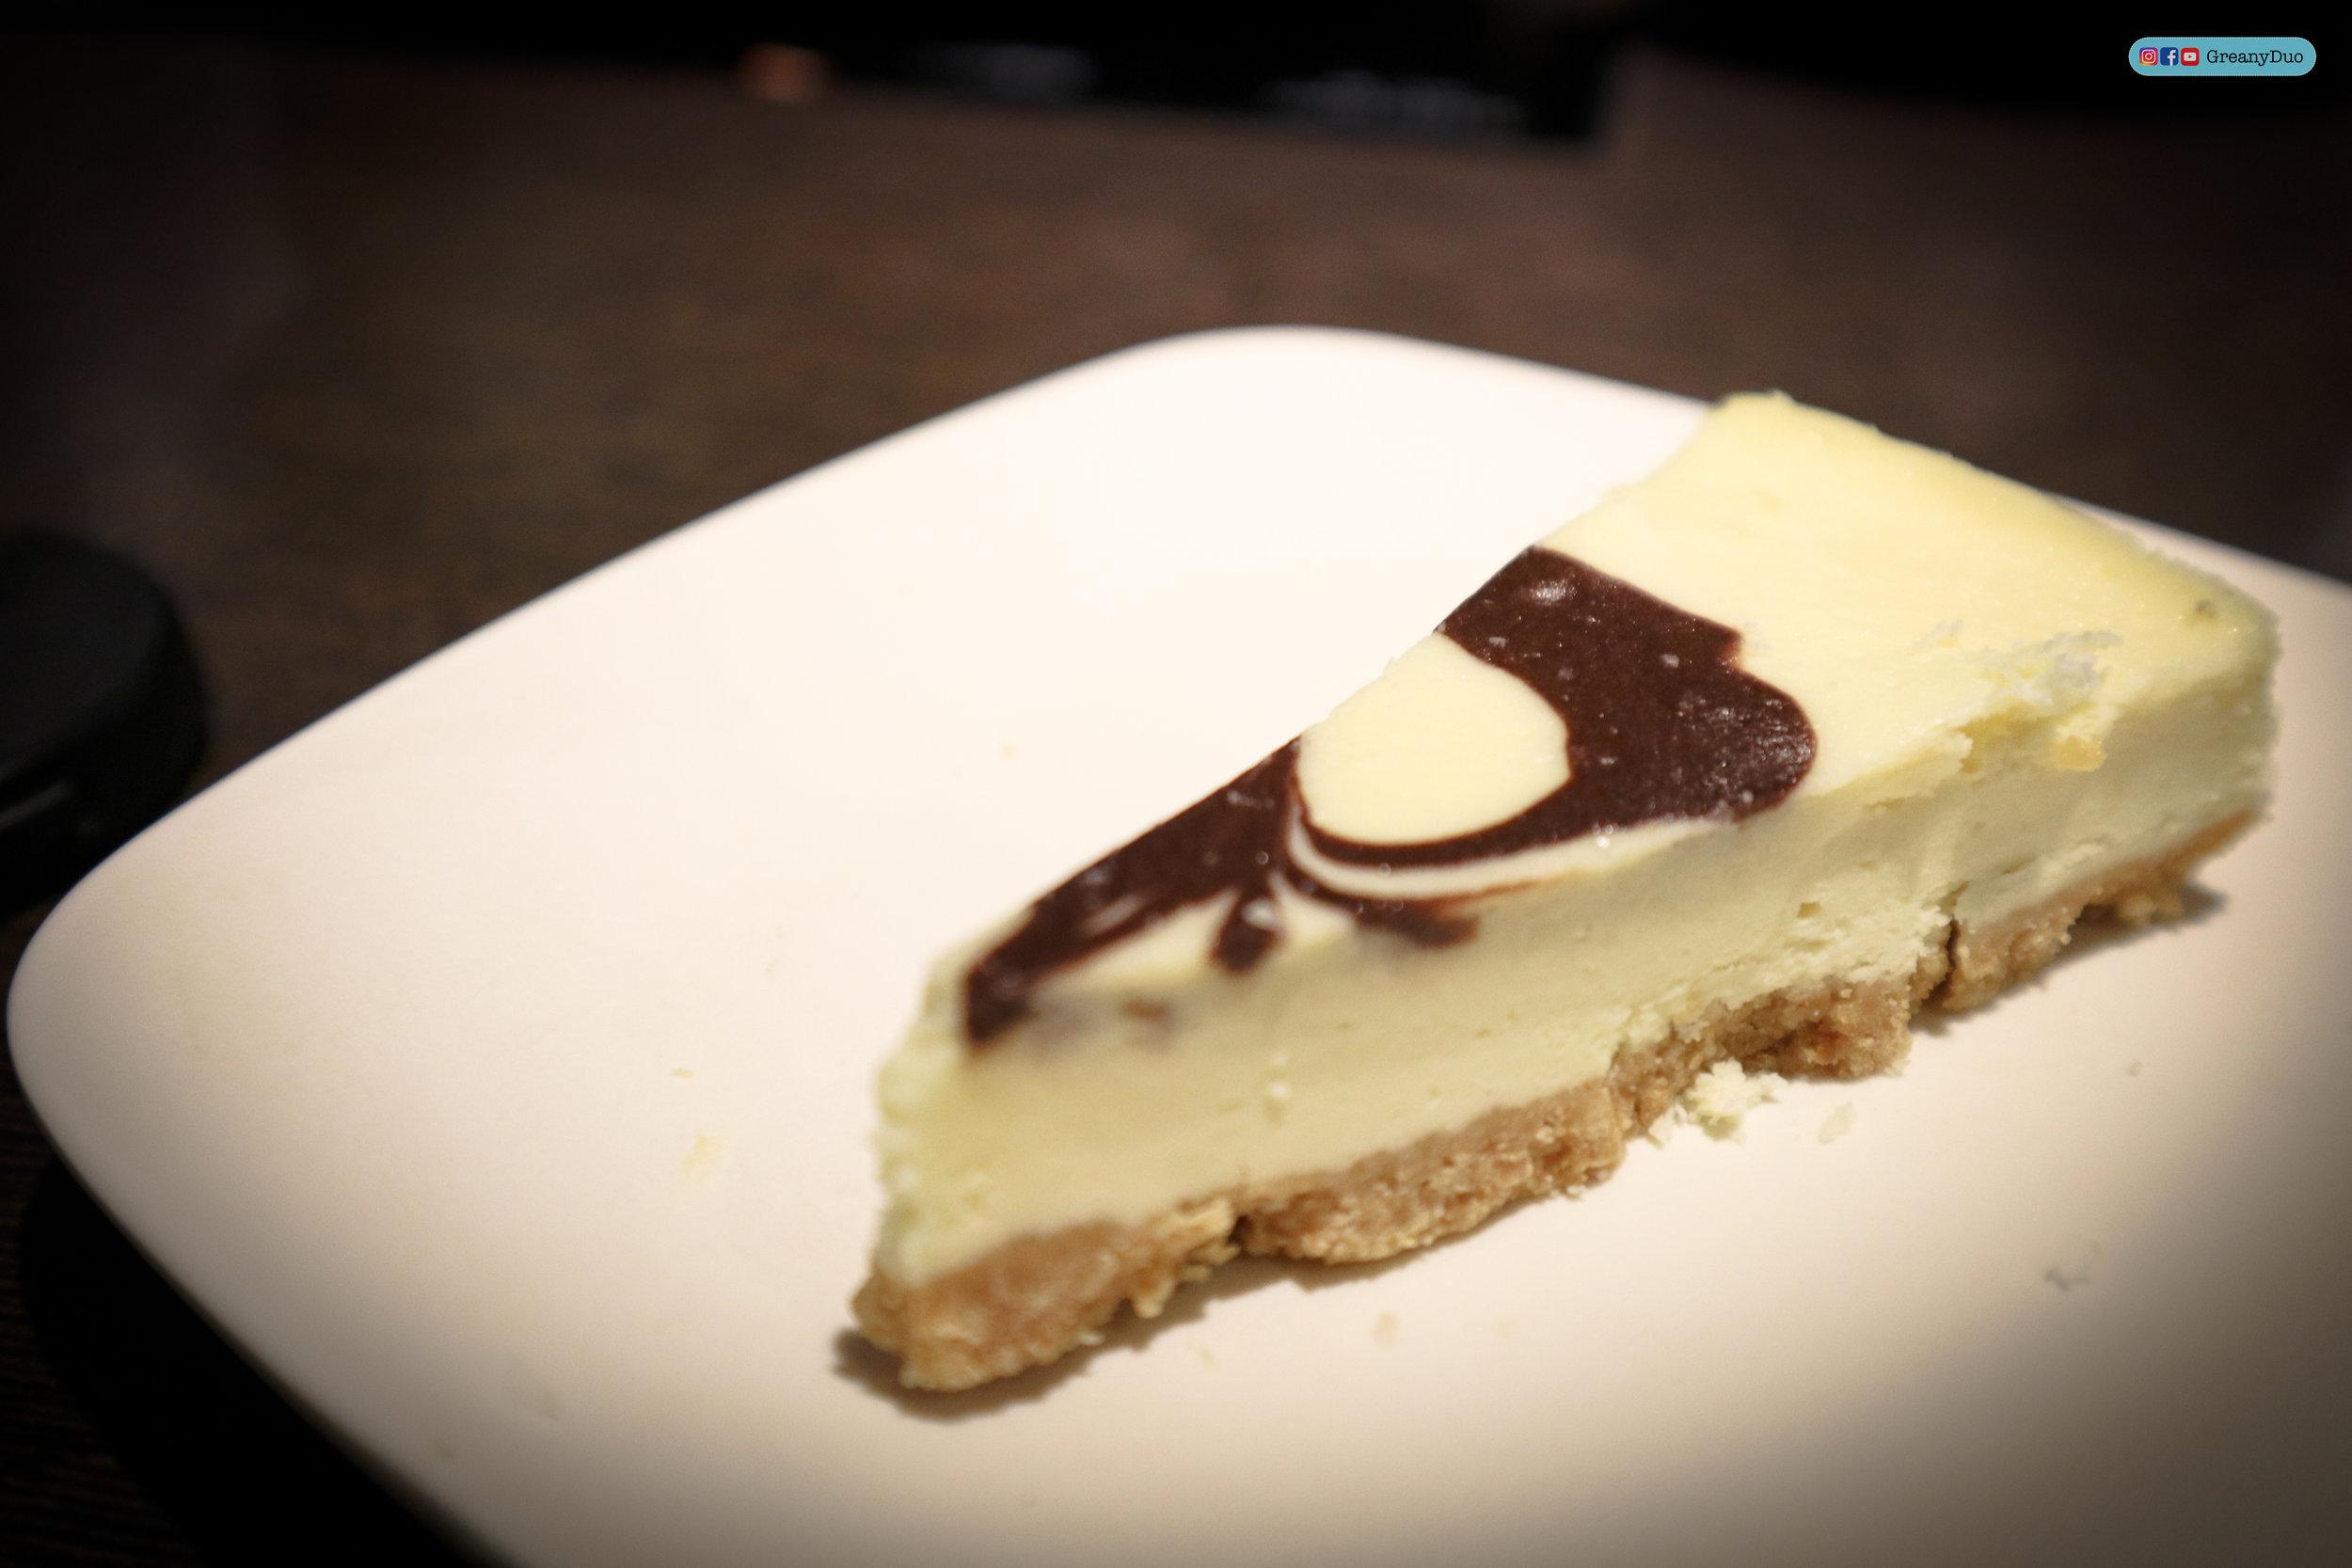 chocolate cheesecake at บุฟเฟ่ต์ชาบูไต้หวันที่ Hakkai Shabu Shabu ซีเหมินติง